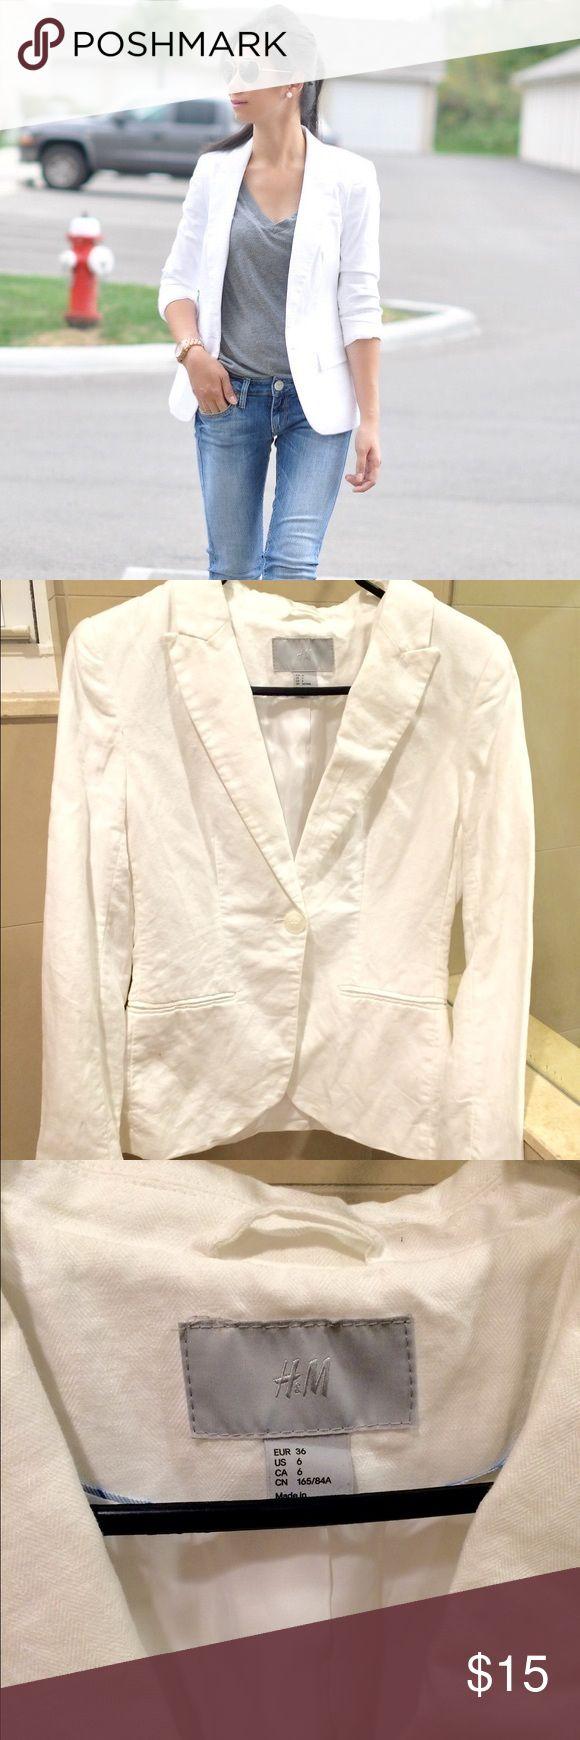 White blazer jacket office Sz S US 6 Worn once H&M Jackets & Coats Blazers